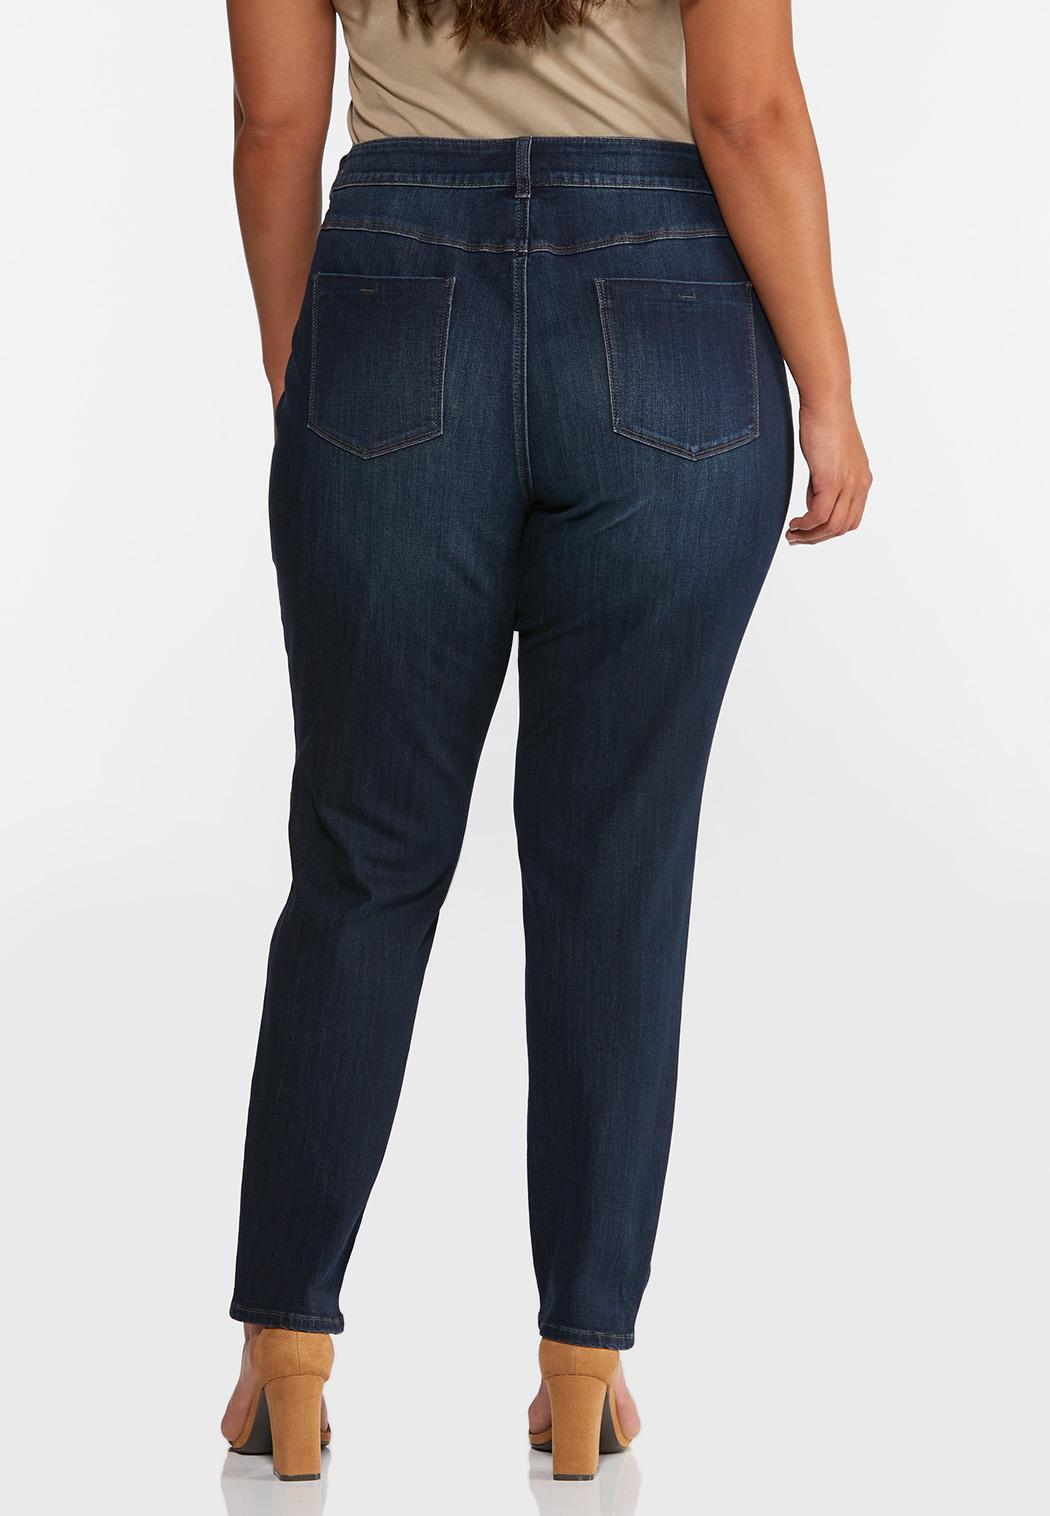 Plus Size Dark Wash Skinny Jeans (Item #44333704)